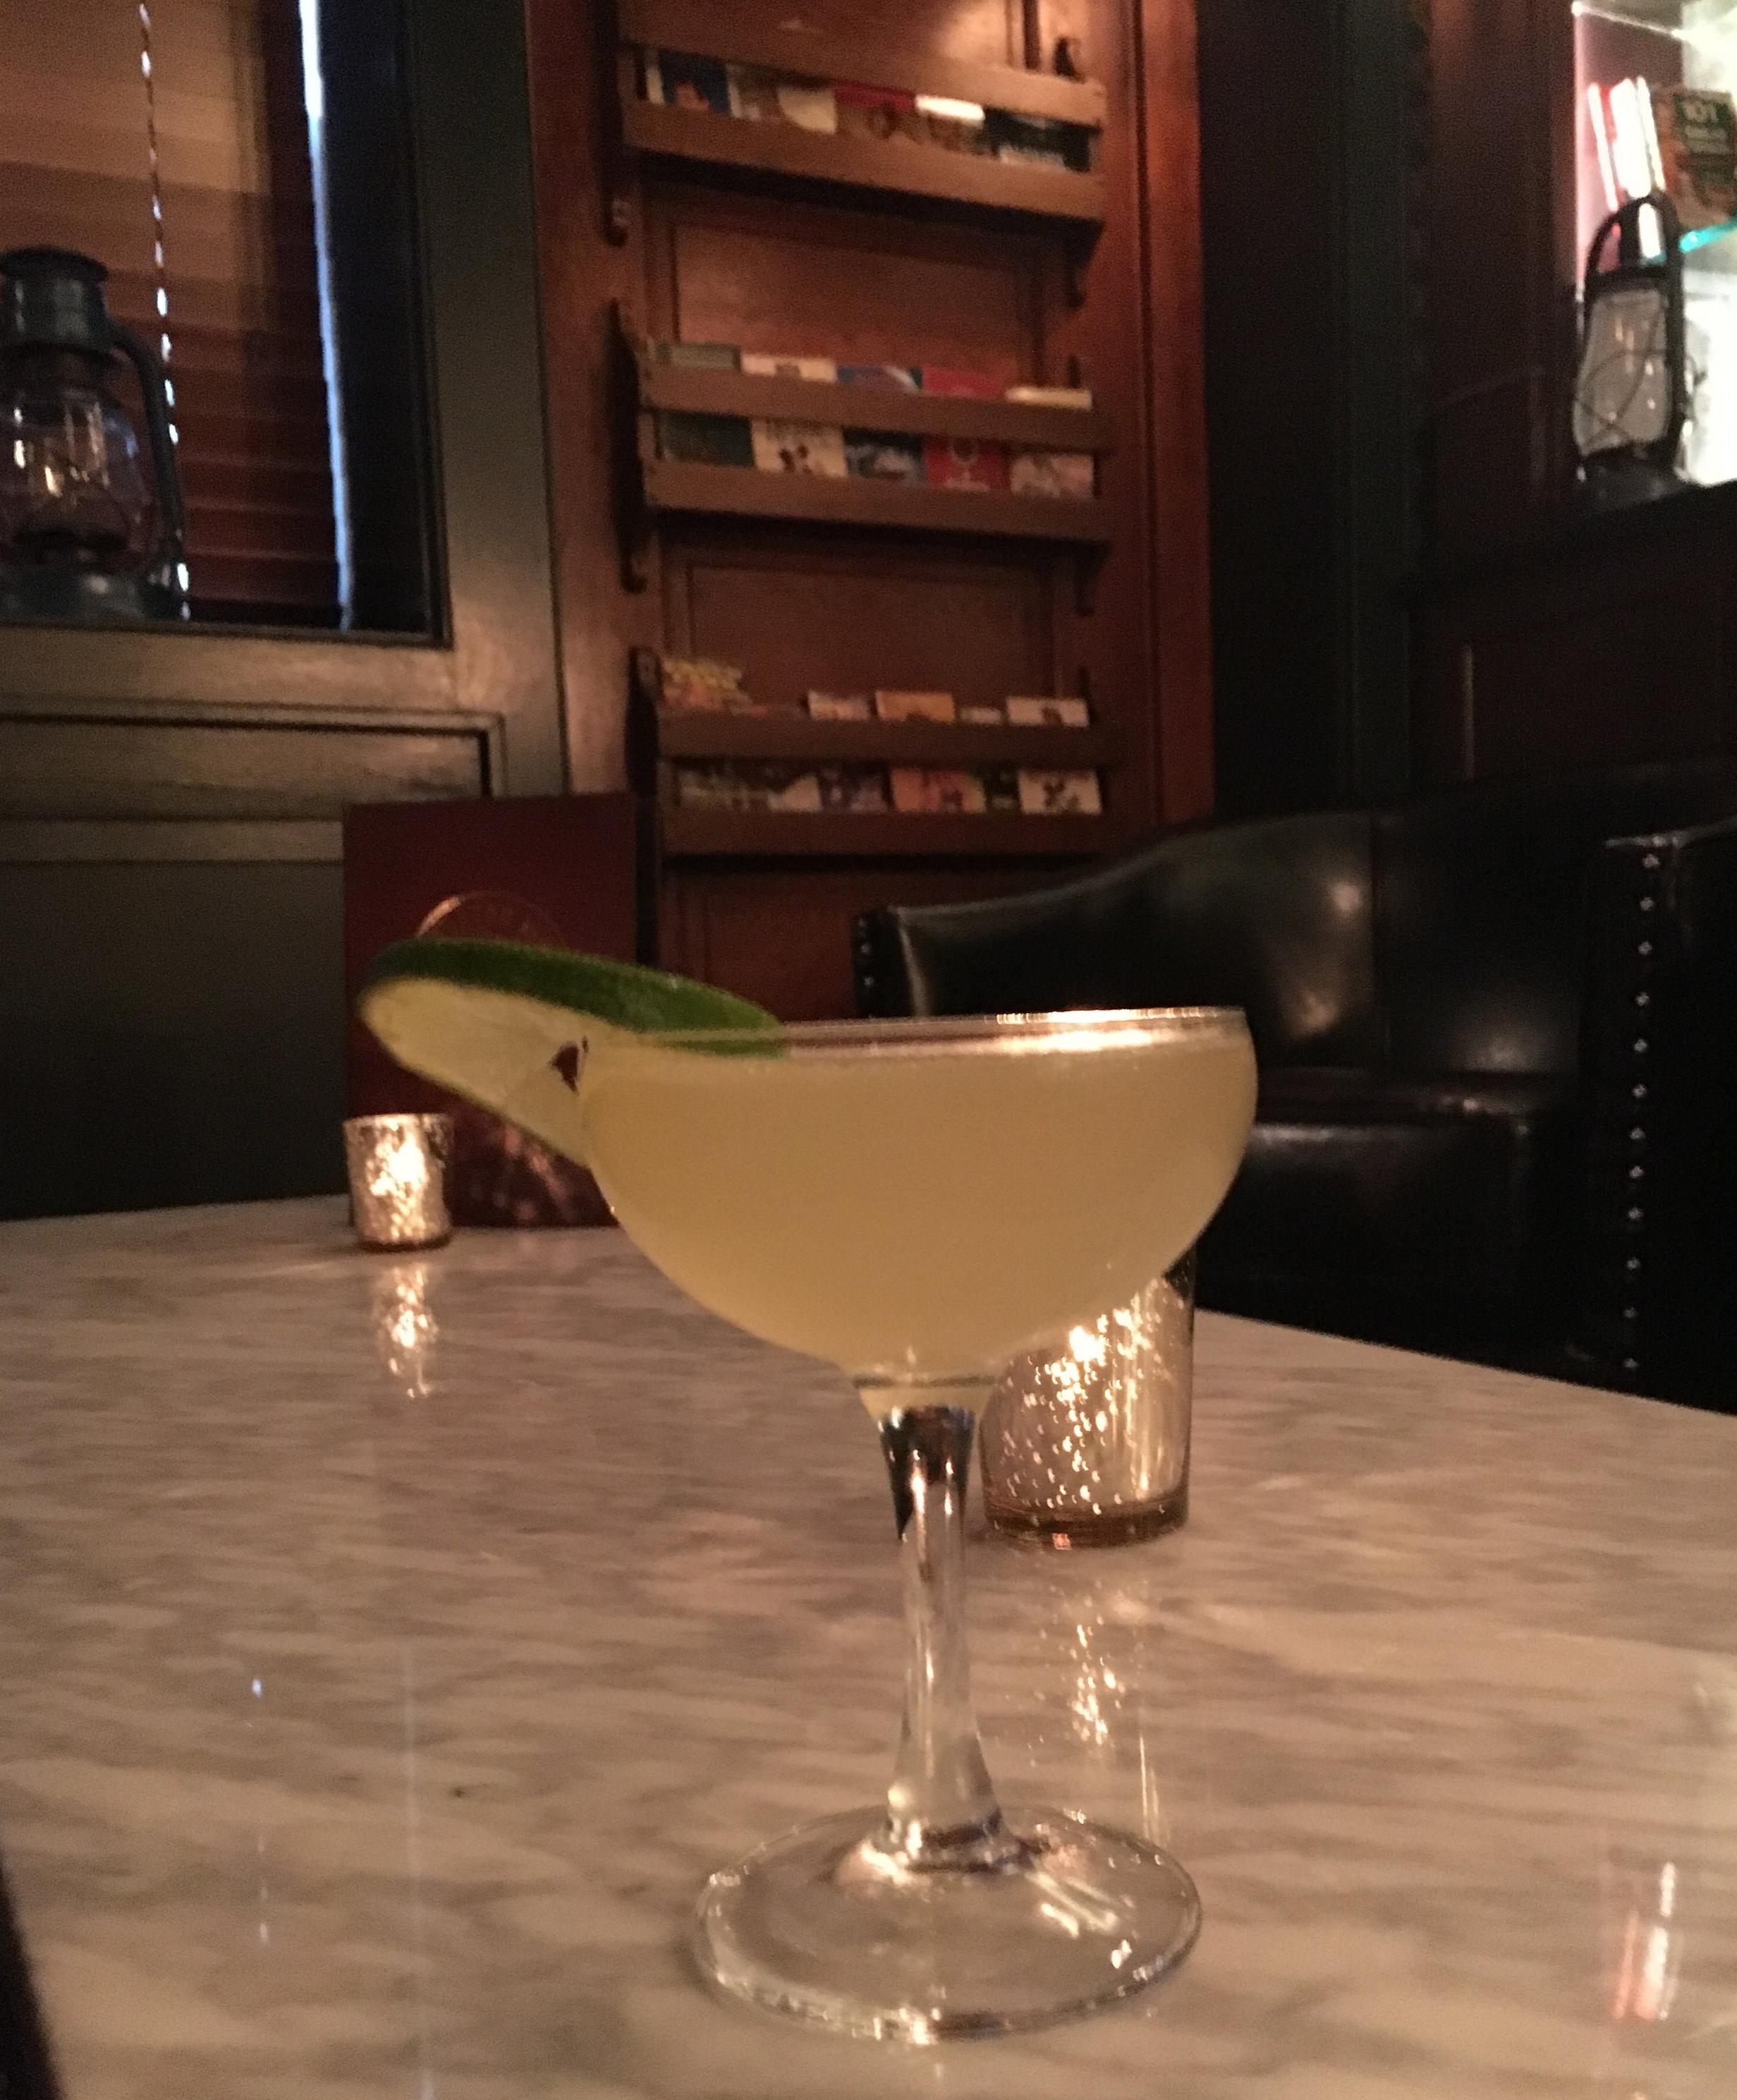 Truxton Inn cocktail